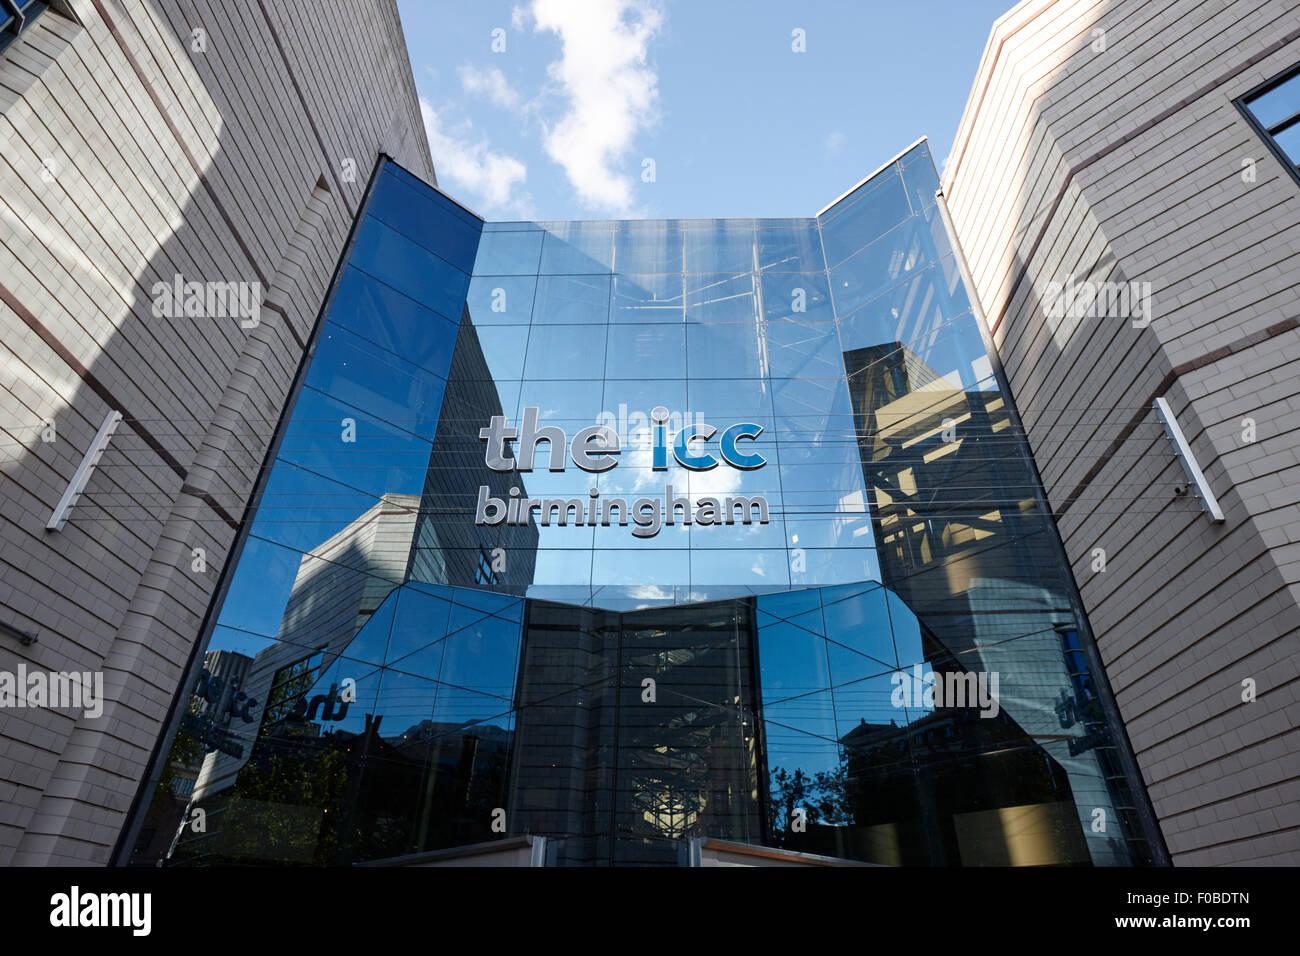 The ICC and symphony hall Birmingham UK - Stock Image